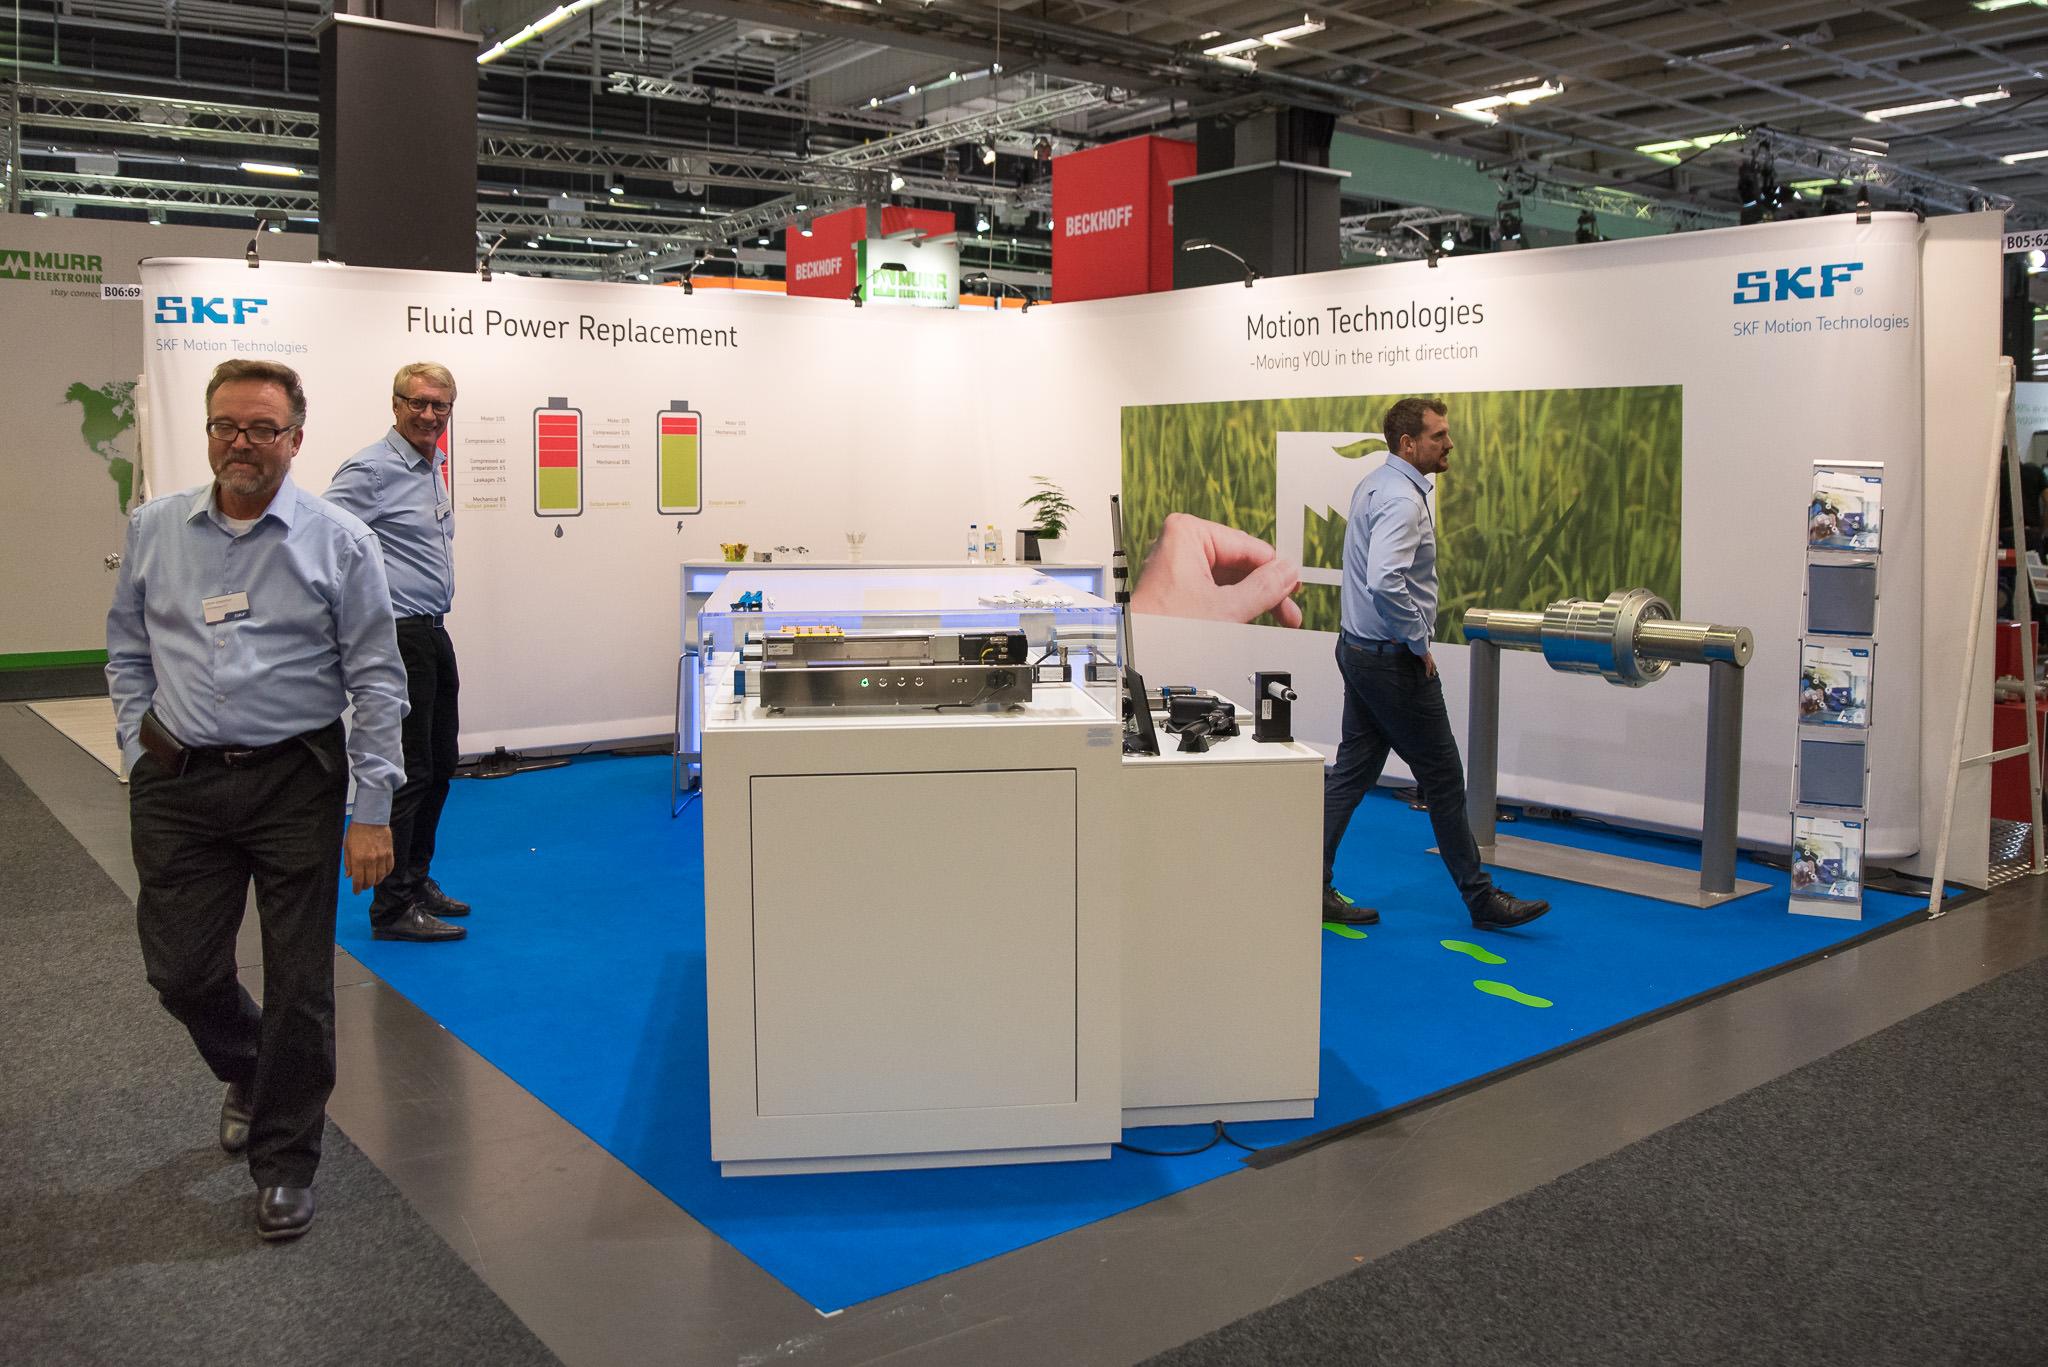 SKF Motion Technologies Monteryta Front Row Exhibitions Scanautomatic 2018 Svenska Mässan Göteborg